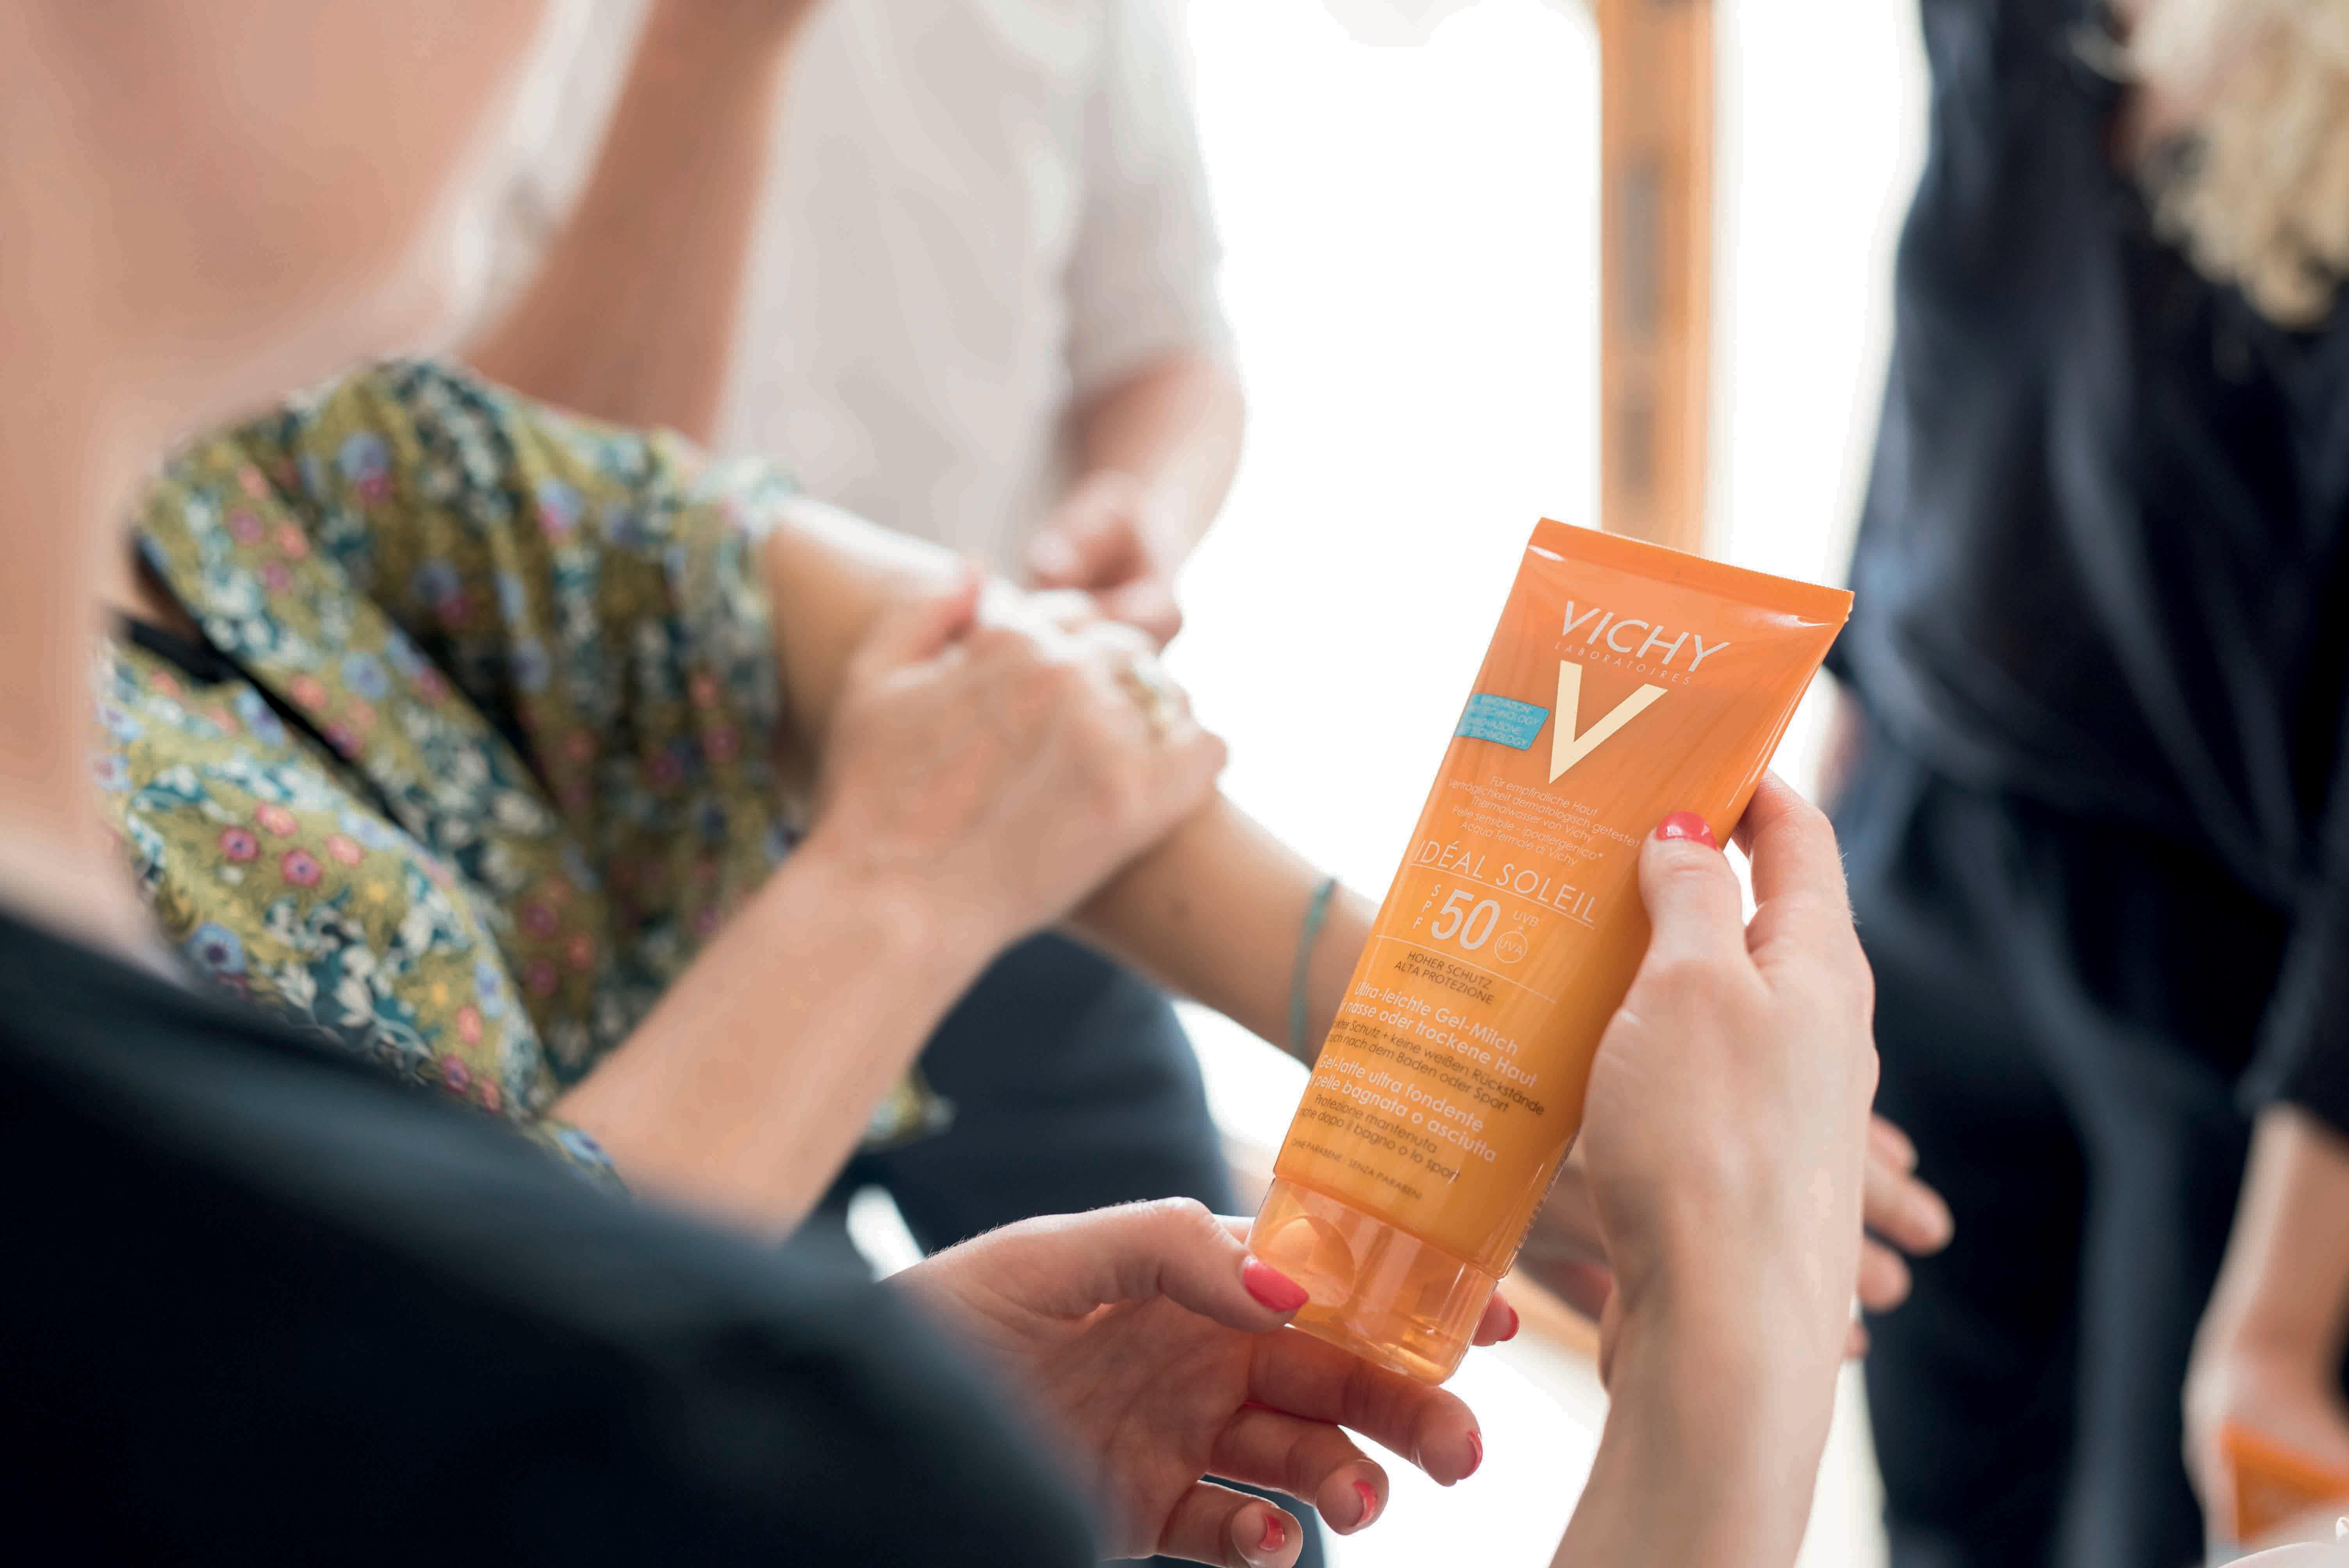 vichy-sonnenpflege-beste-creme-test